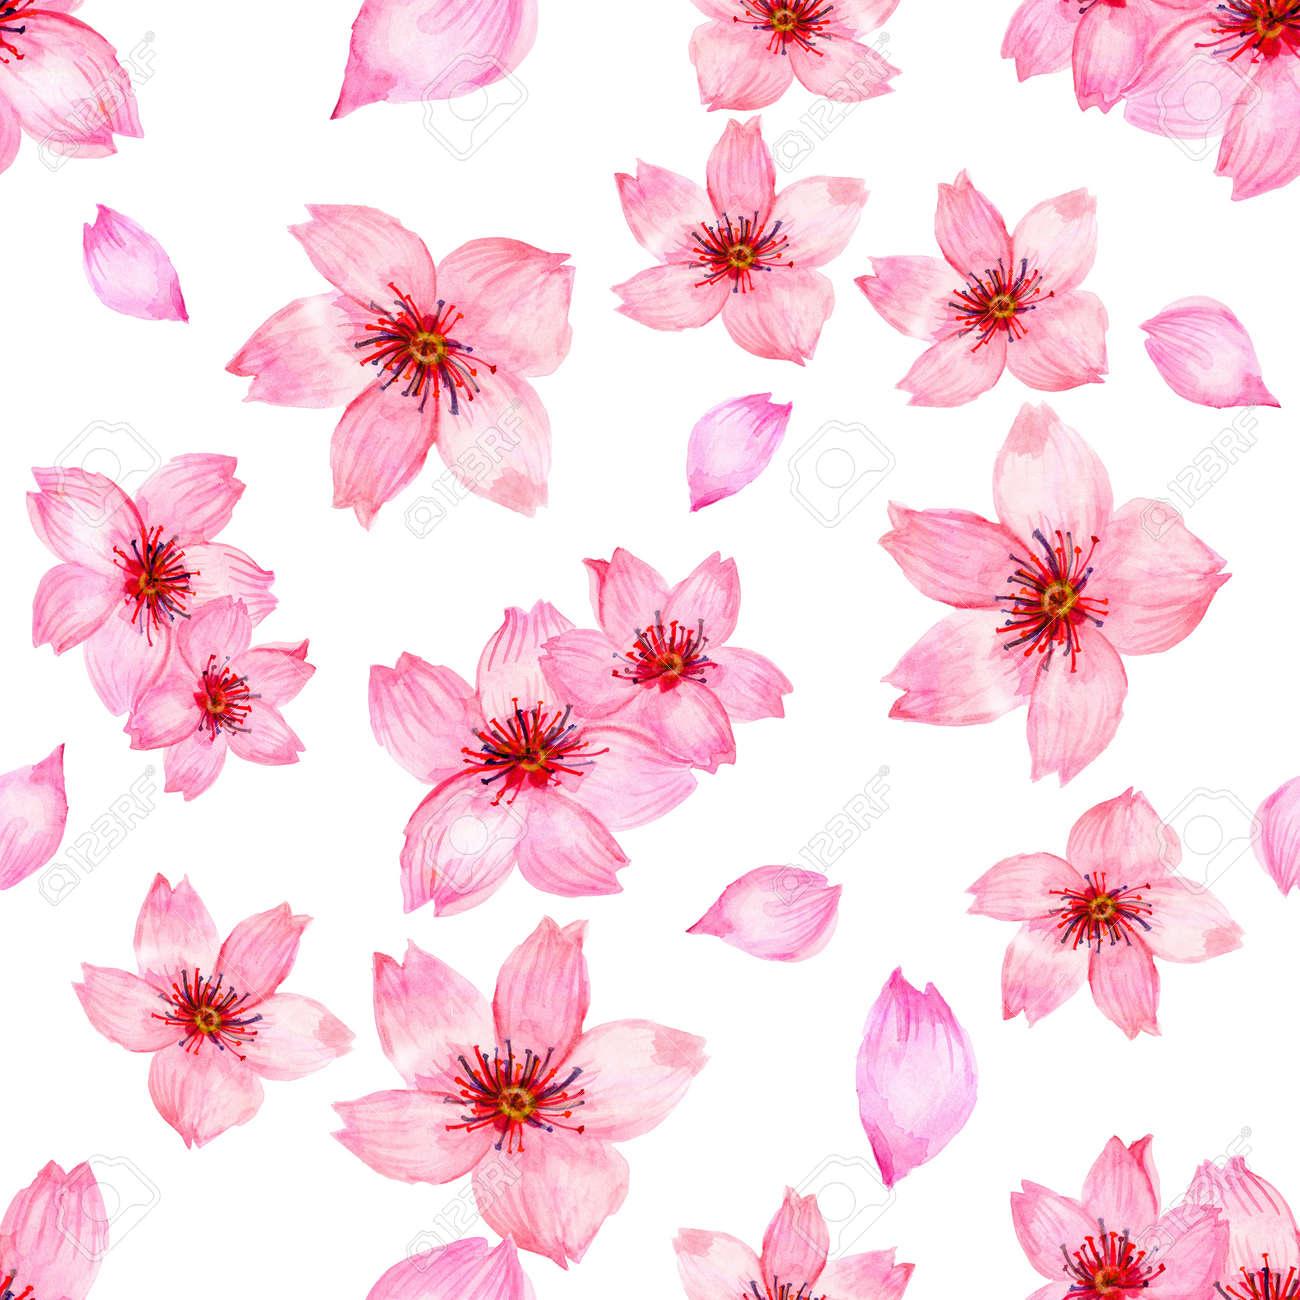 Watercolor Pink Cherry Blossom Sakura Japan Season Flower Isolated